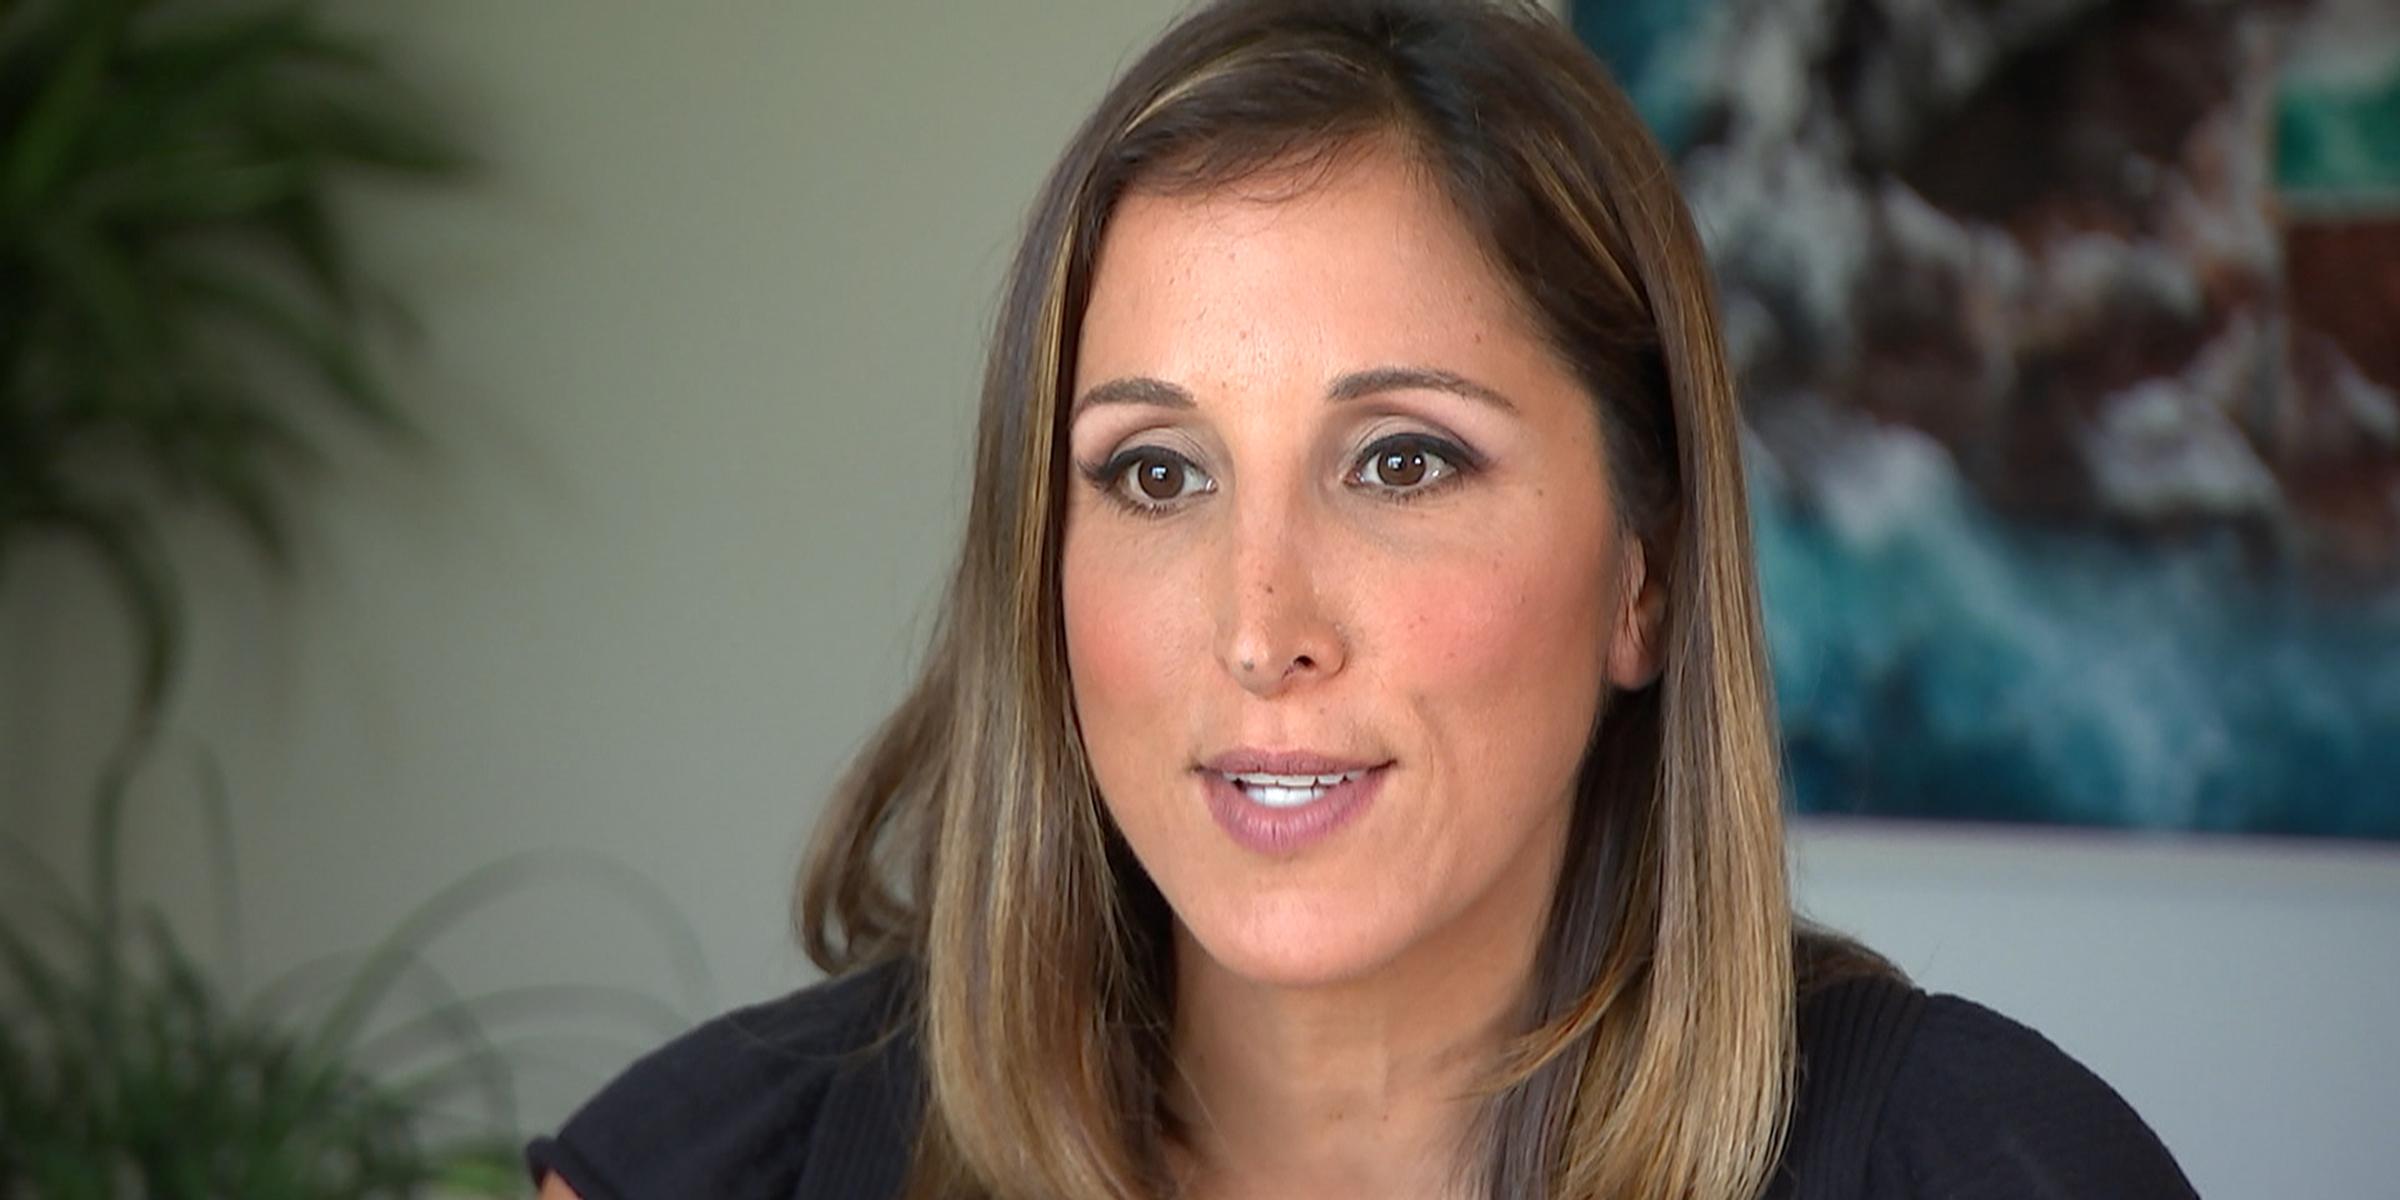 MSNBC anchor Yasmin Vossoughian opens up about birthmark on her leg